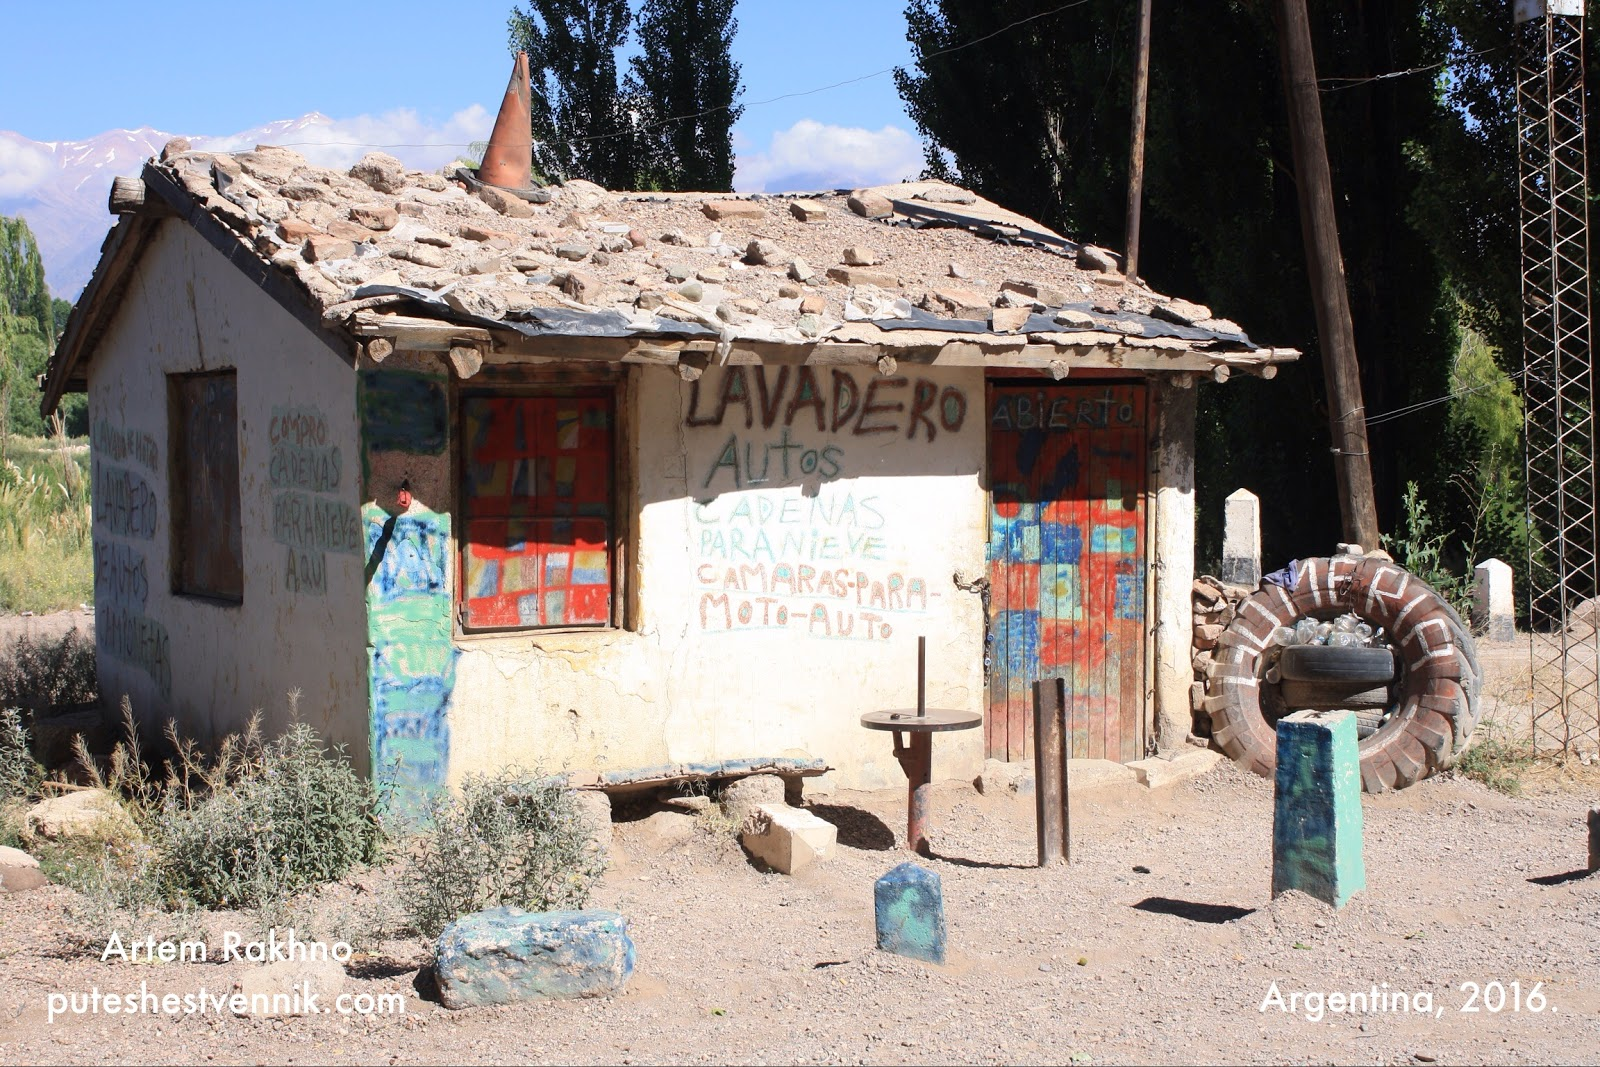 Дом на обочине дороги в Аргентине